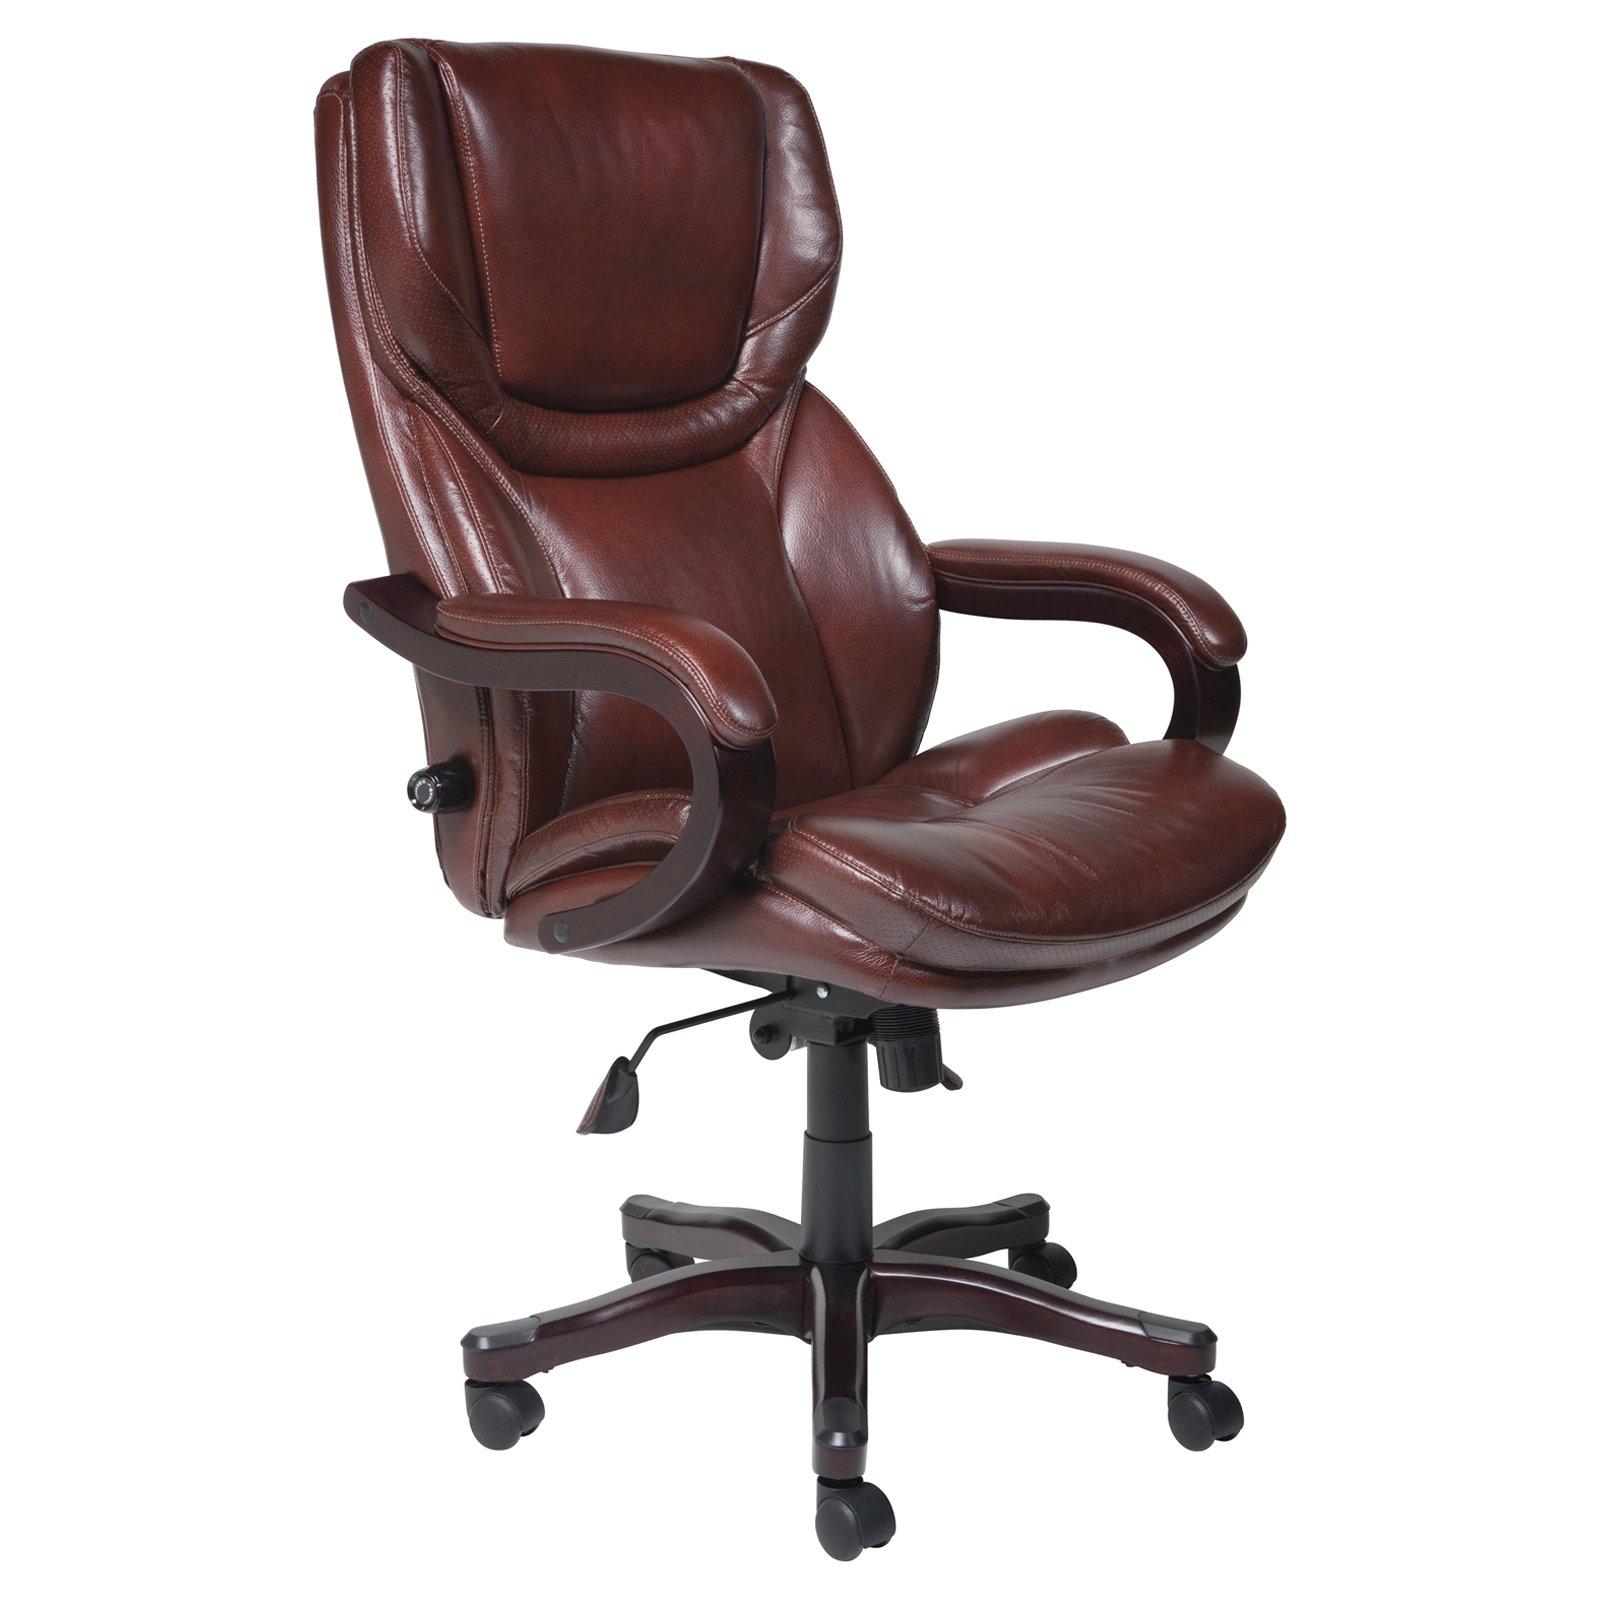 Belleze Executive Reclining Office Chair High Back Faux Leather Footrest  Armchair Recline w/ Backrest Pillow, Black - Traveller Location